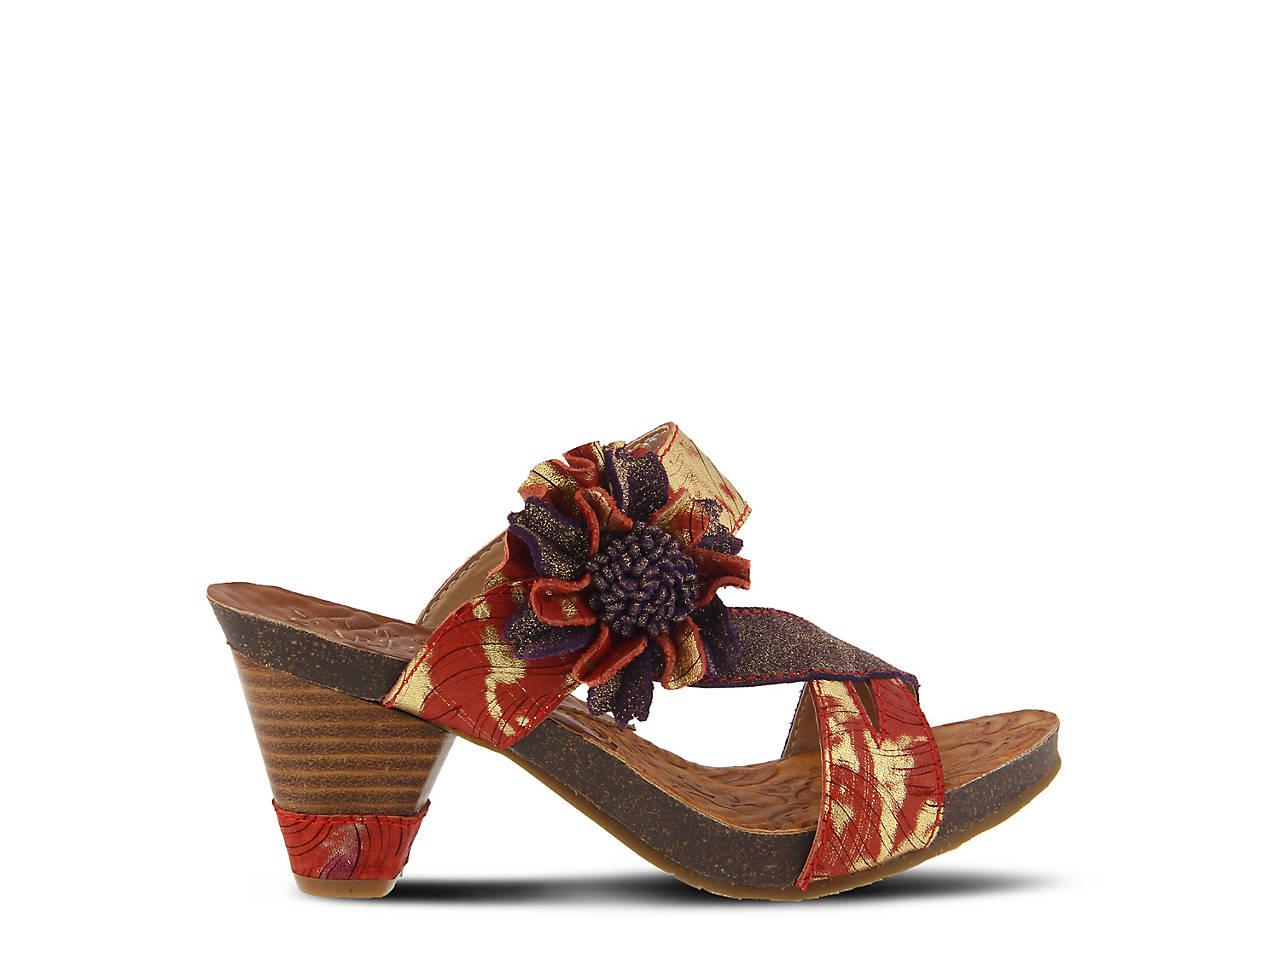 e398cbffb87 L Artiste by Spring Step Myah Sandal Women s Shoes